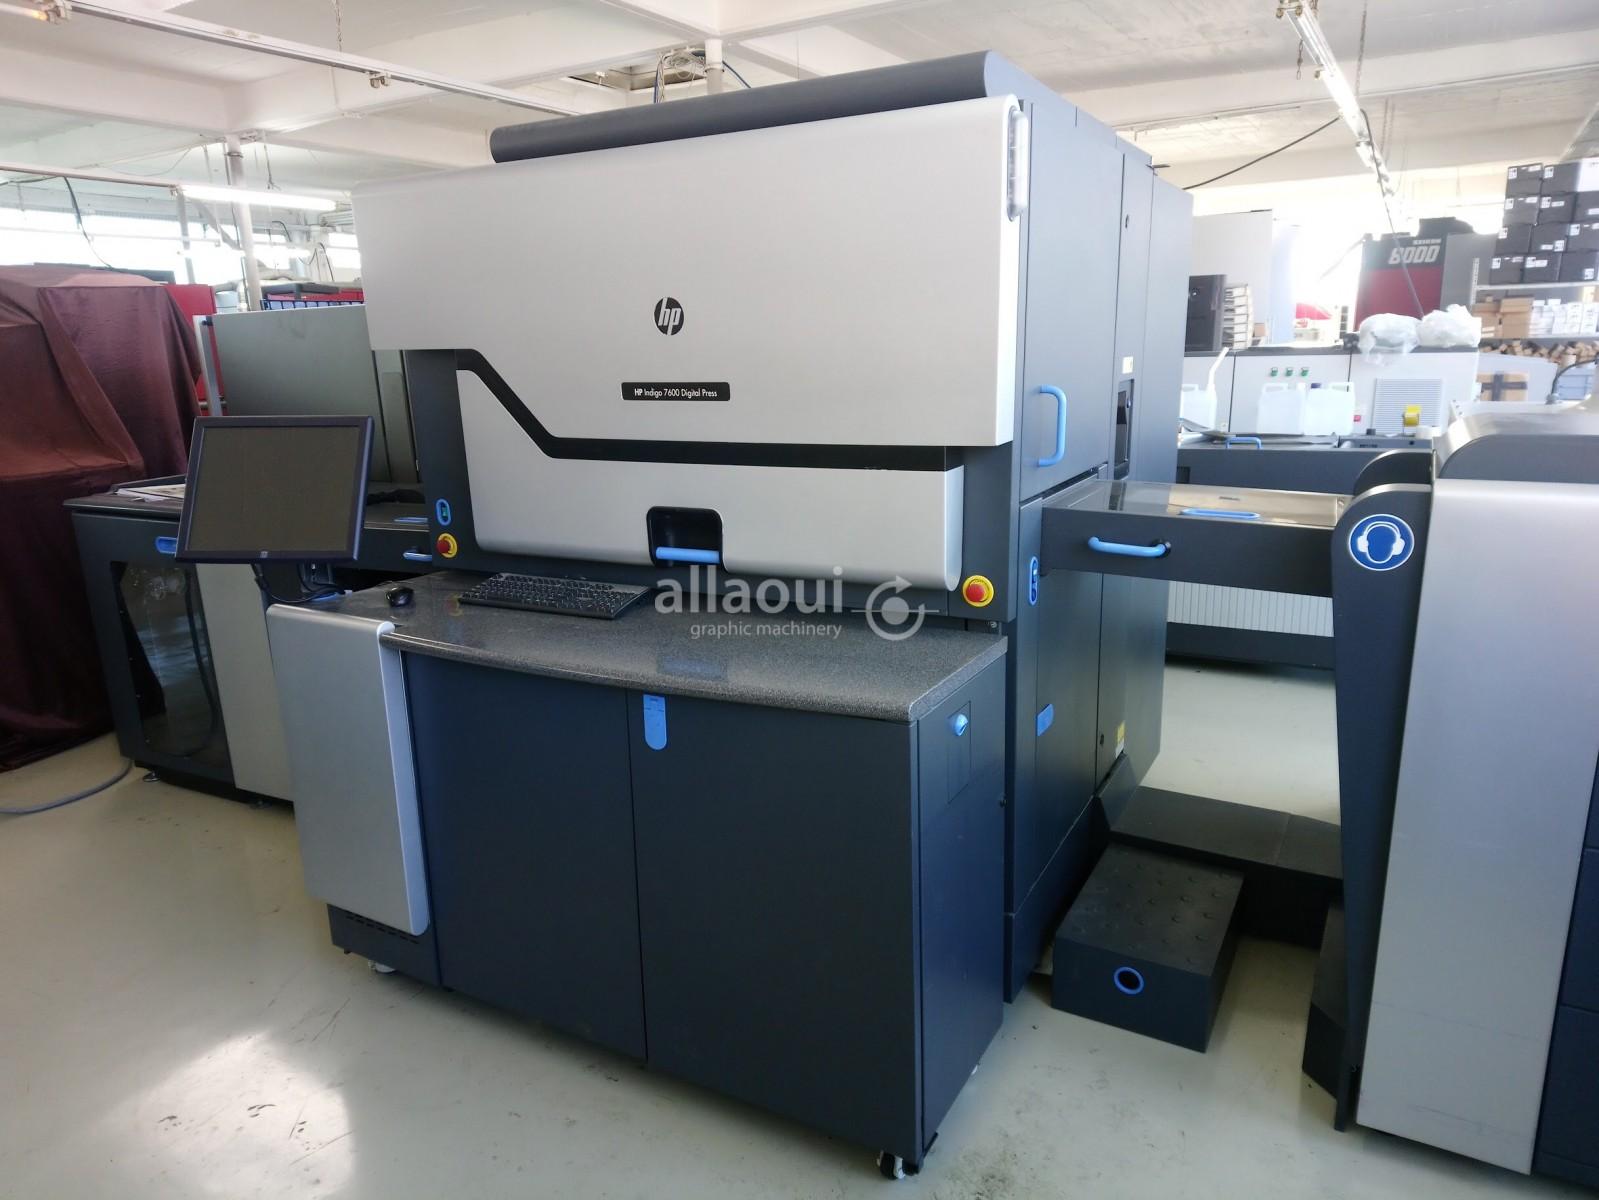 HP Indigo Digital Press 7600 Picture 1